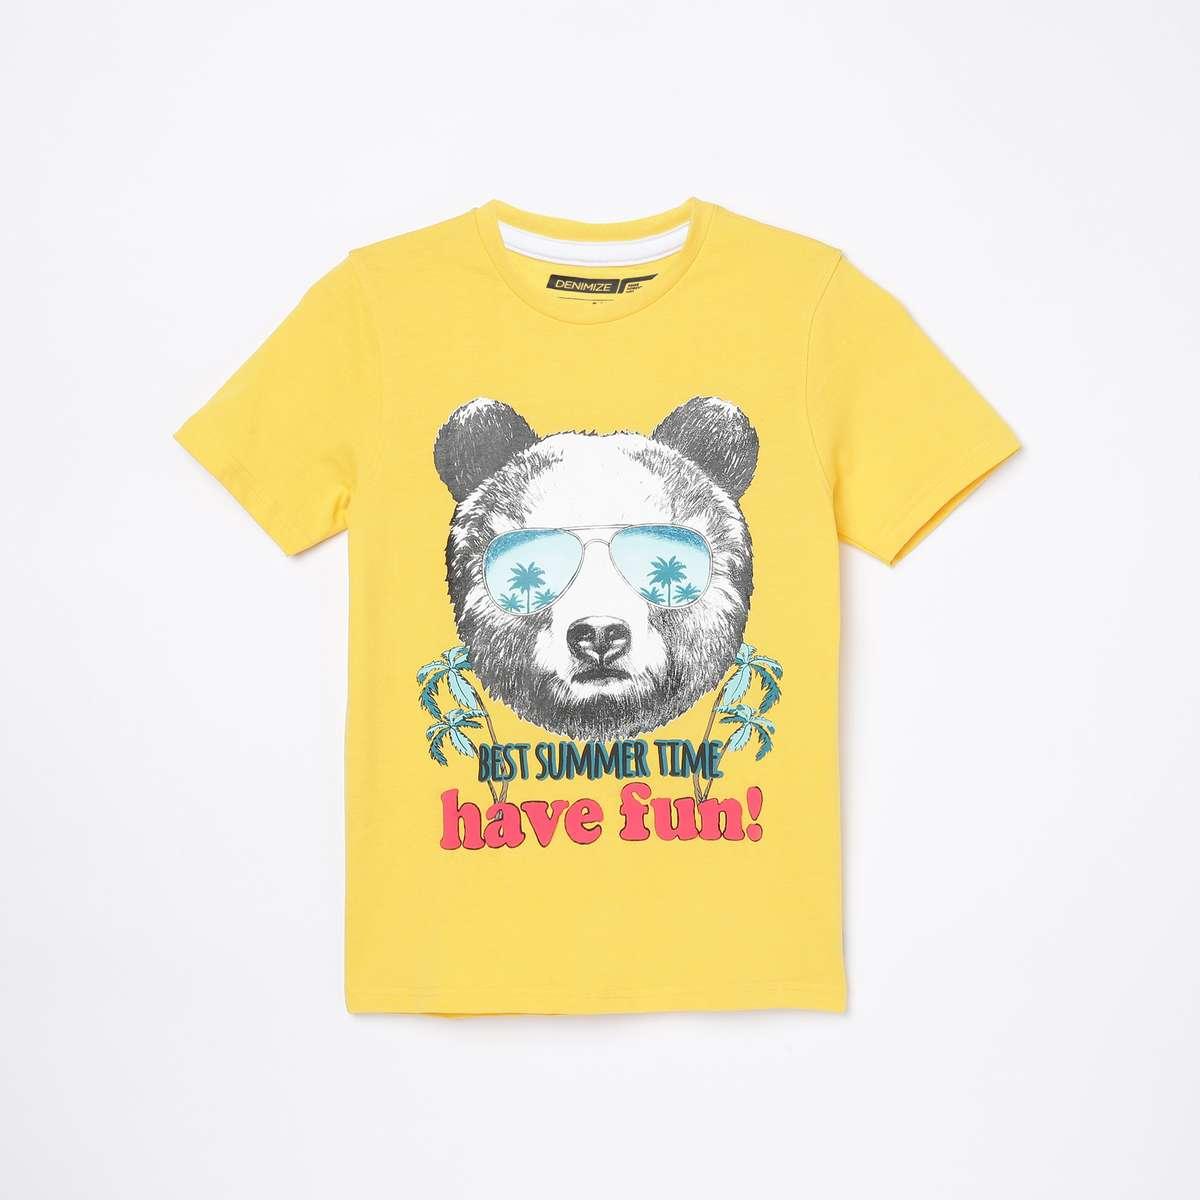 4.DENIMIZE Boys Graphic Print Crew Neck T-shirt